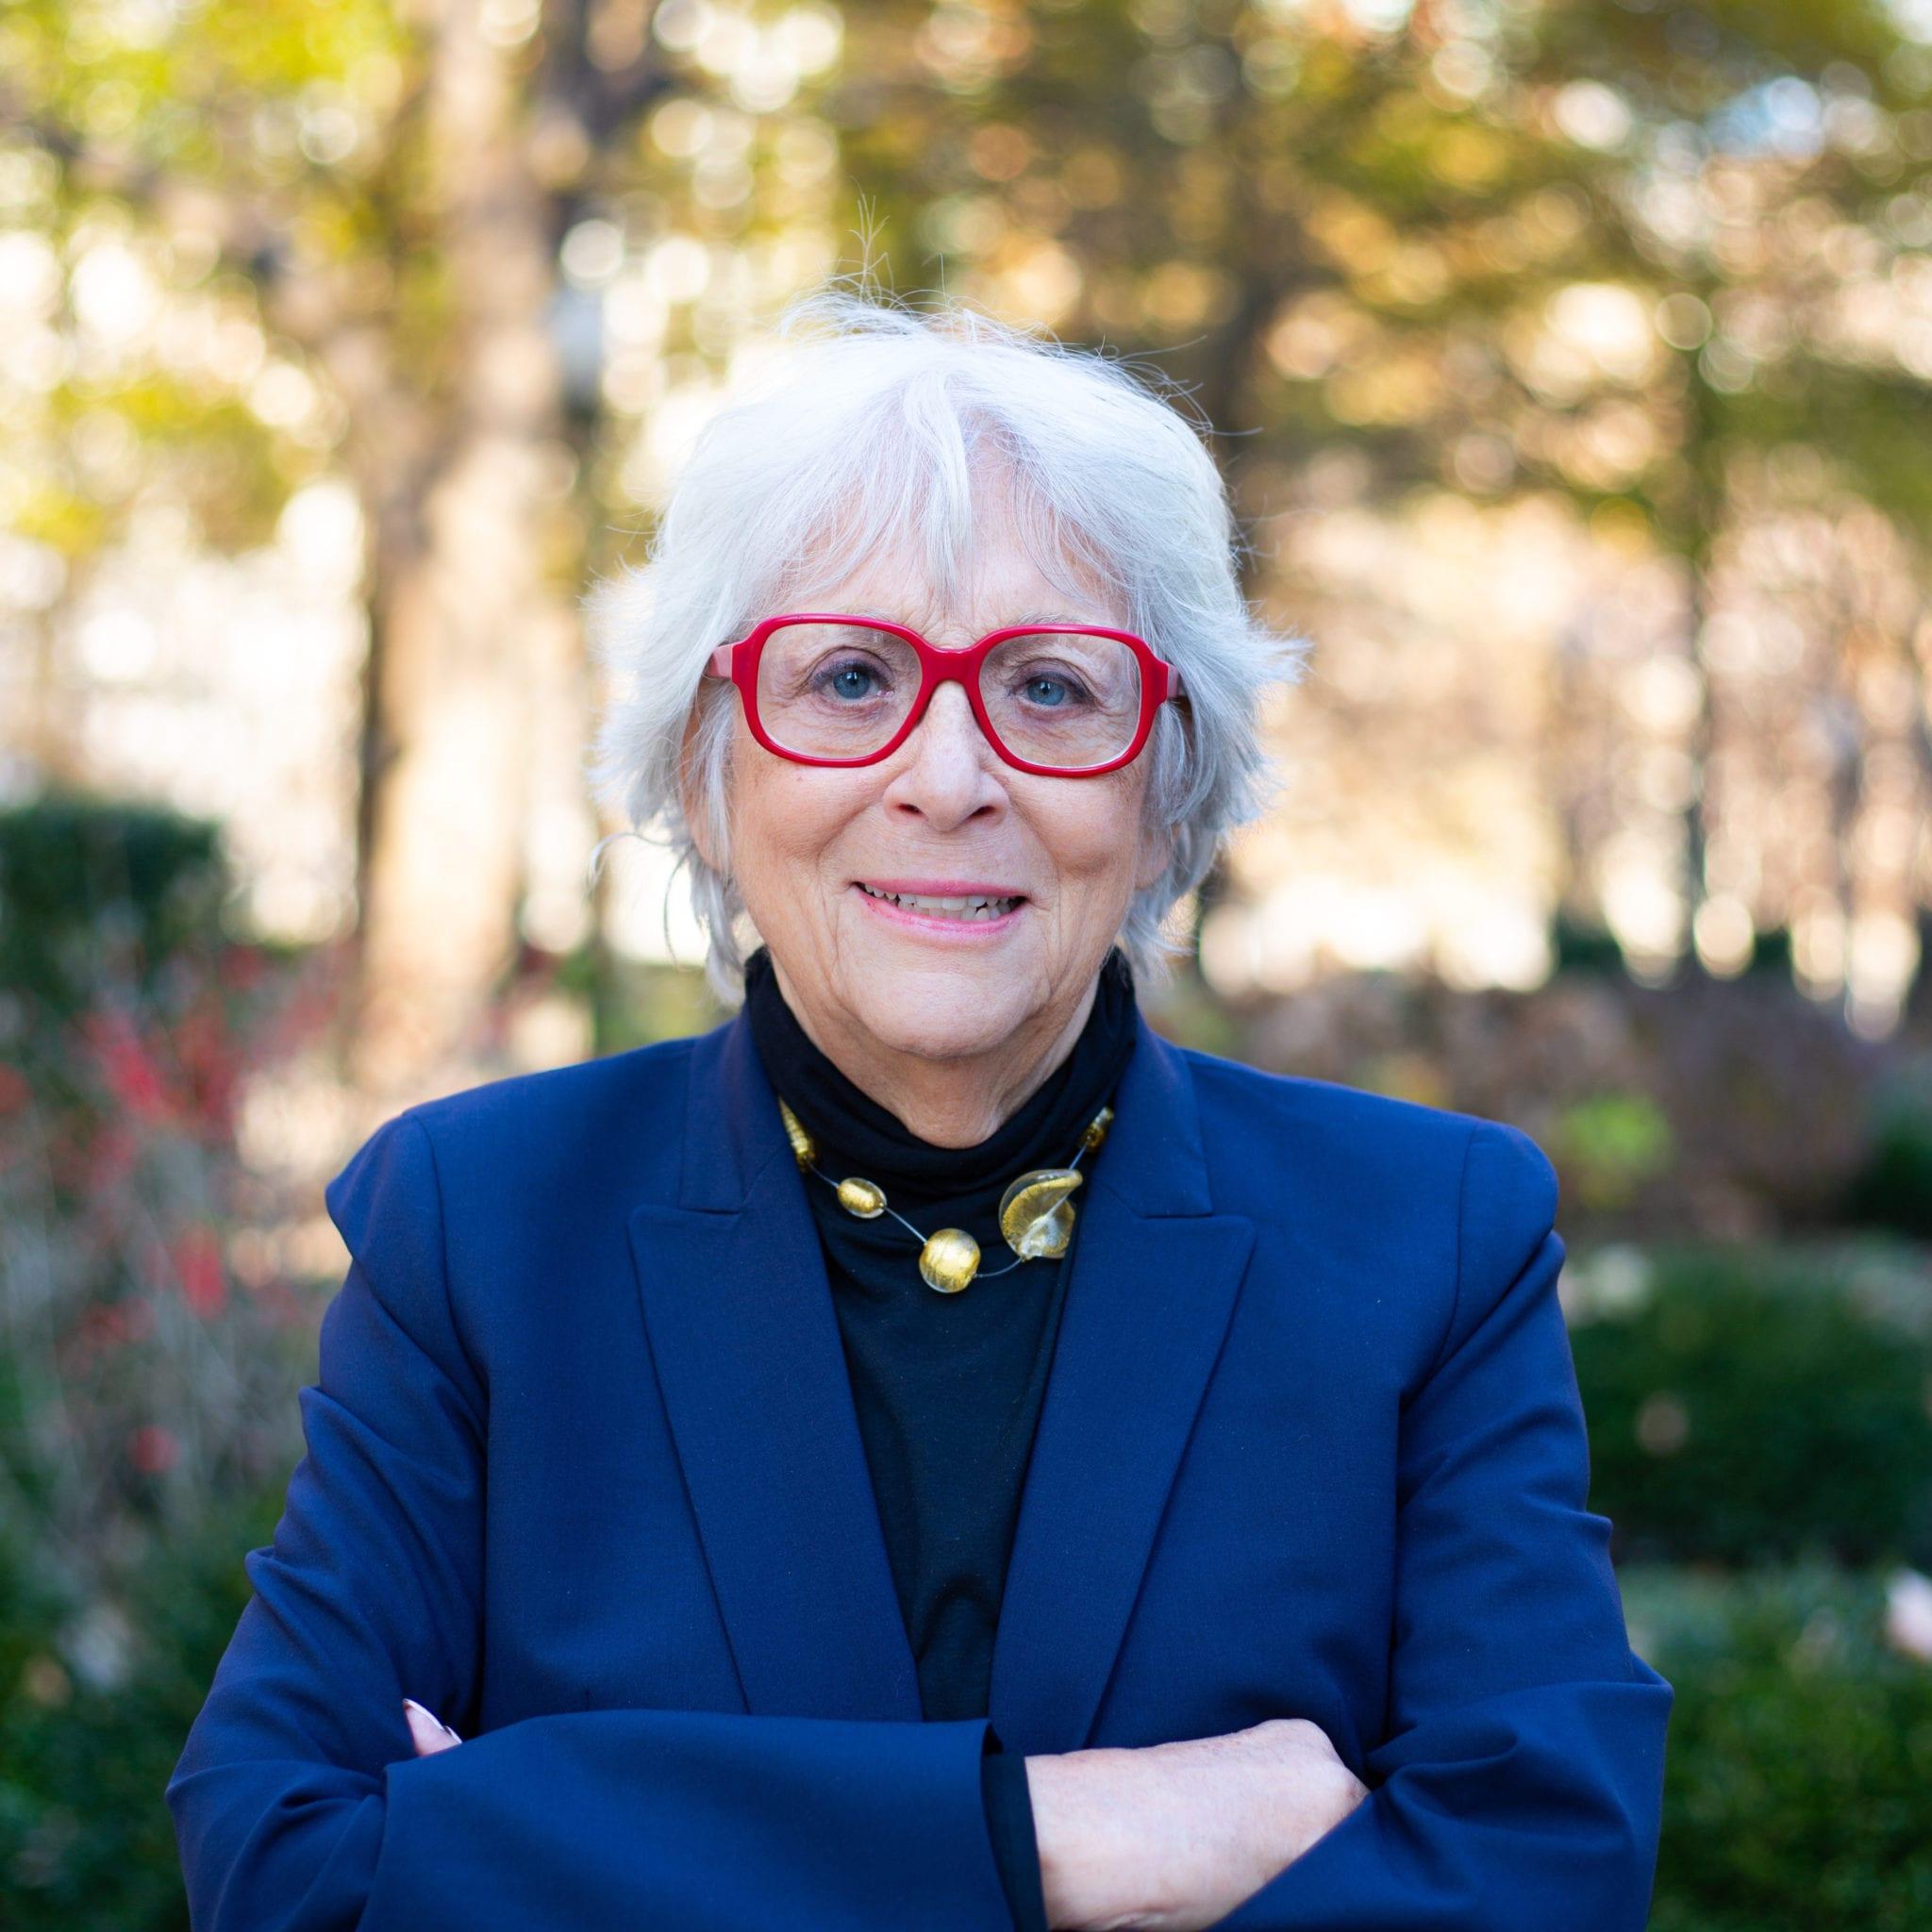 Phyllis Greenberg